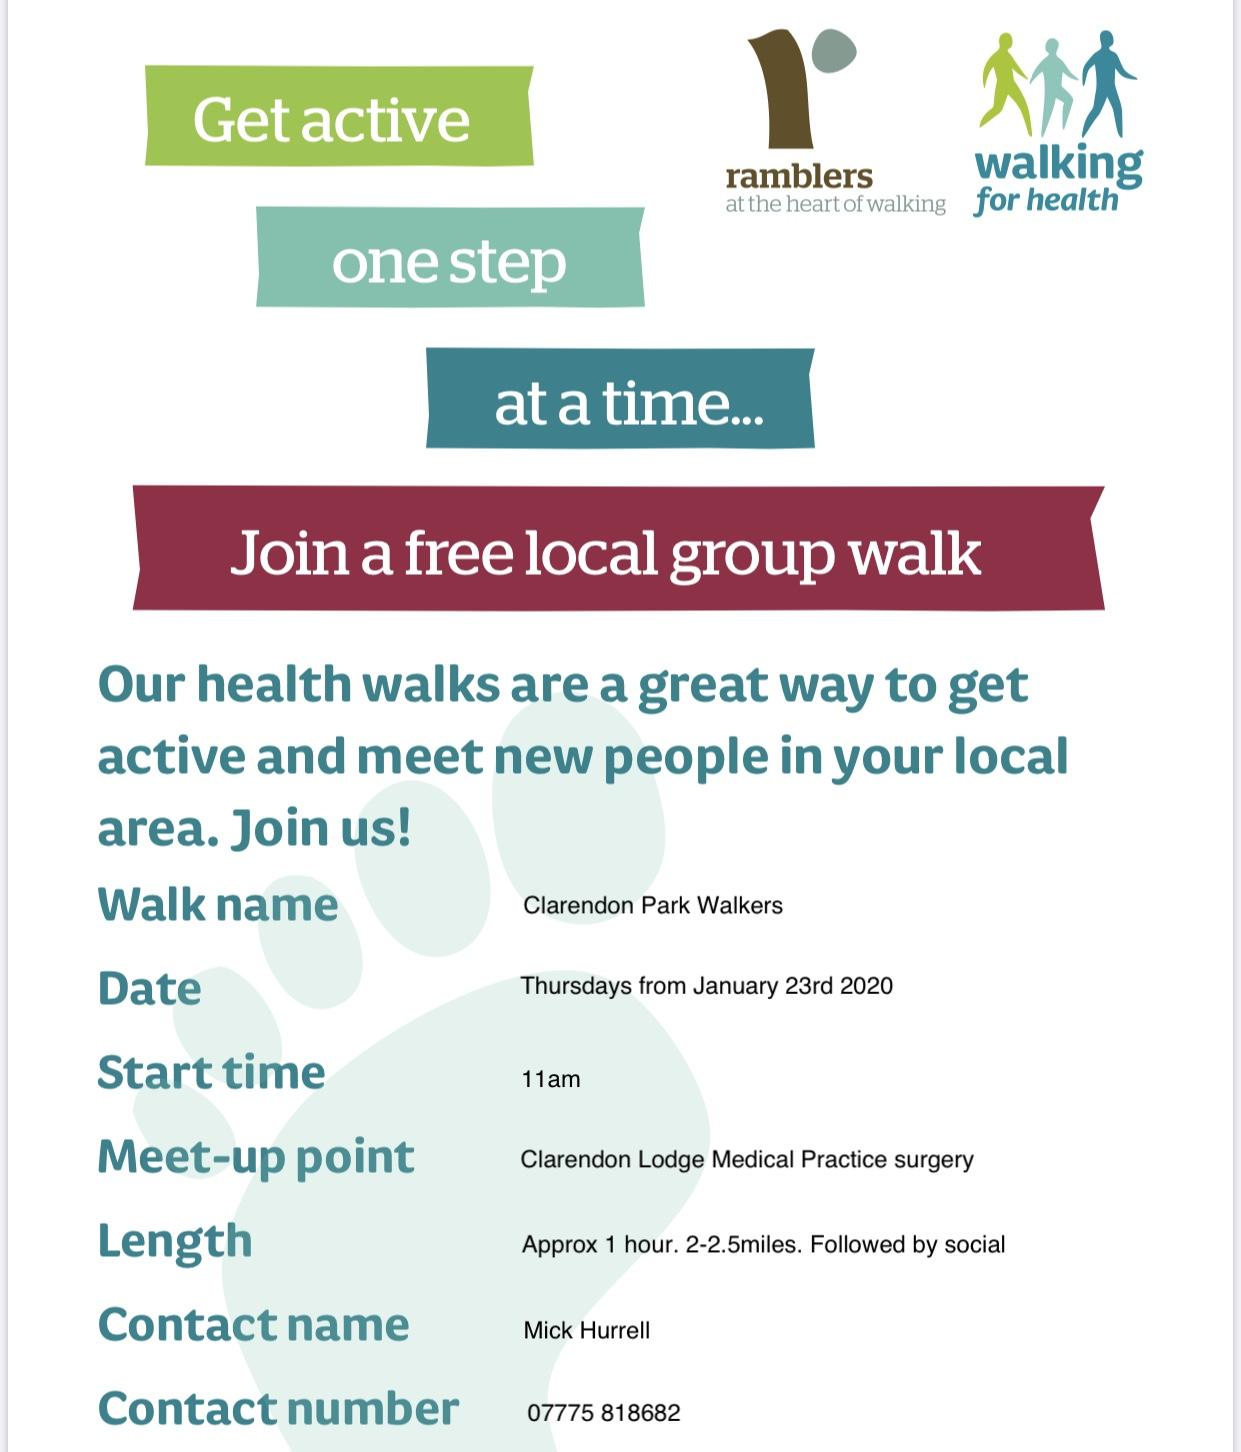 Walks for health